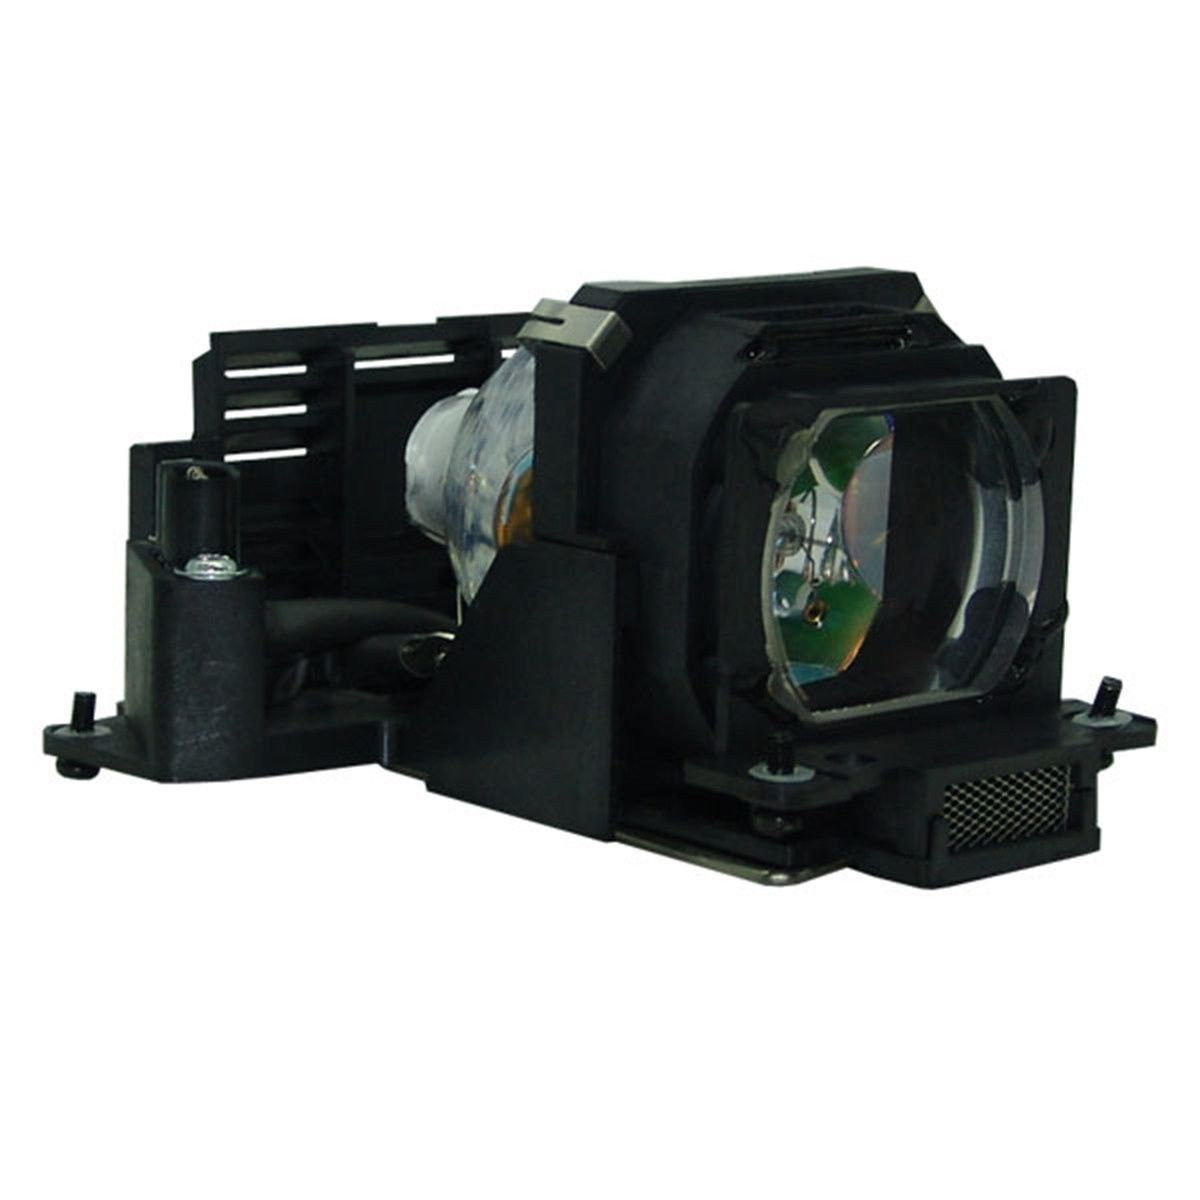 Projector Lamp Bulb LMP-C150 LMPC150 for SONY VPL-CS6 VPL-CS5 VPL-CX5 VPL-EX1 VPL-CX6 With housing original replacement projector lamp bulb lmp f272 for sony vpl fx35 vpl fh30 vpl fh35 vpl fh31 projector nsha275w